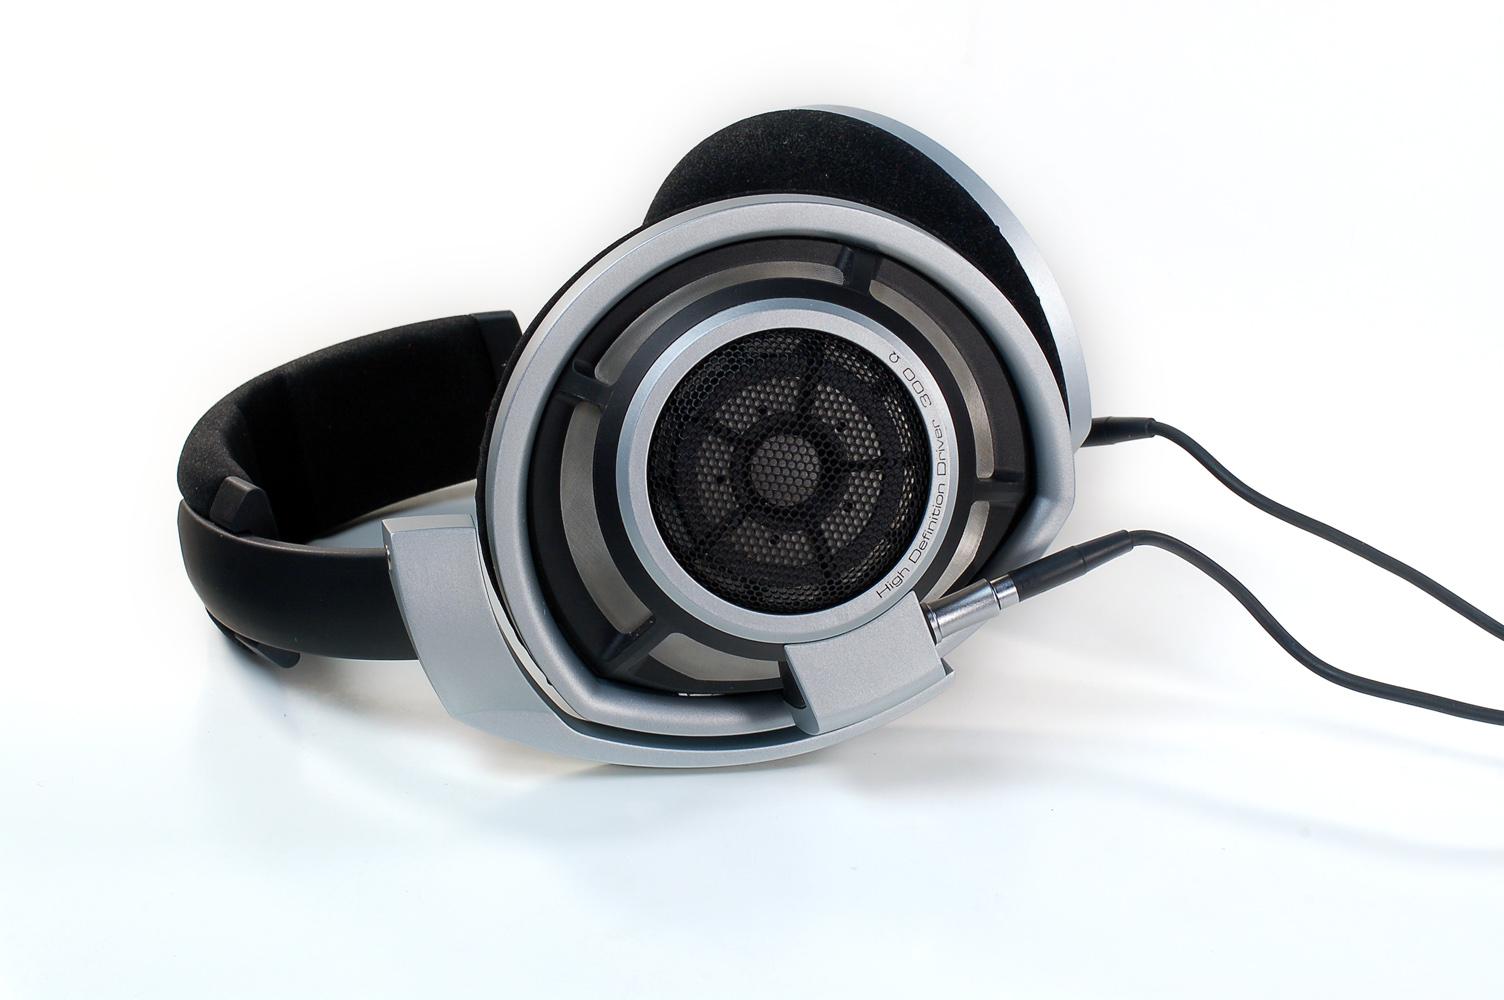 fs sennheiser hd800 headphone reviews and discussion head. Black Bedroom Furniture Sets. Home Design Ideas